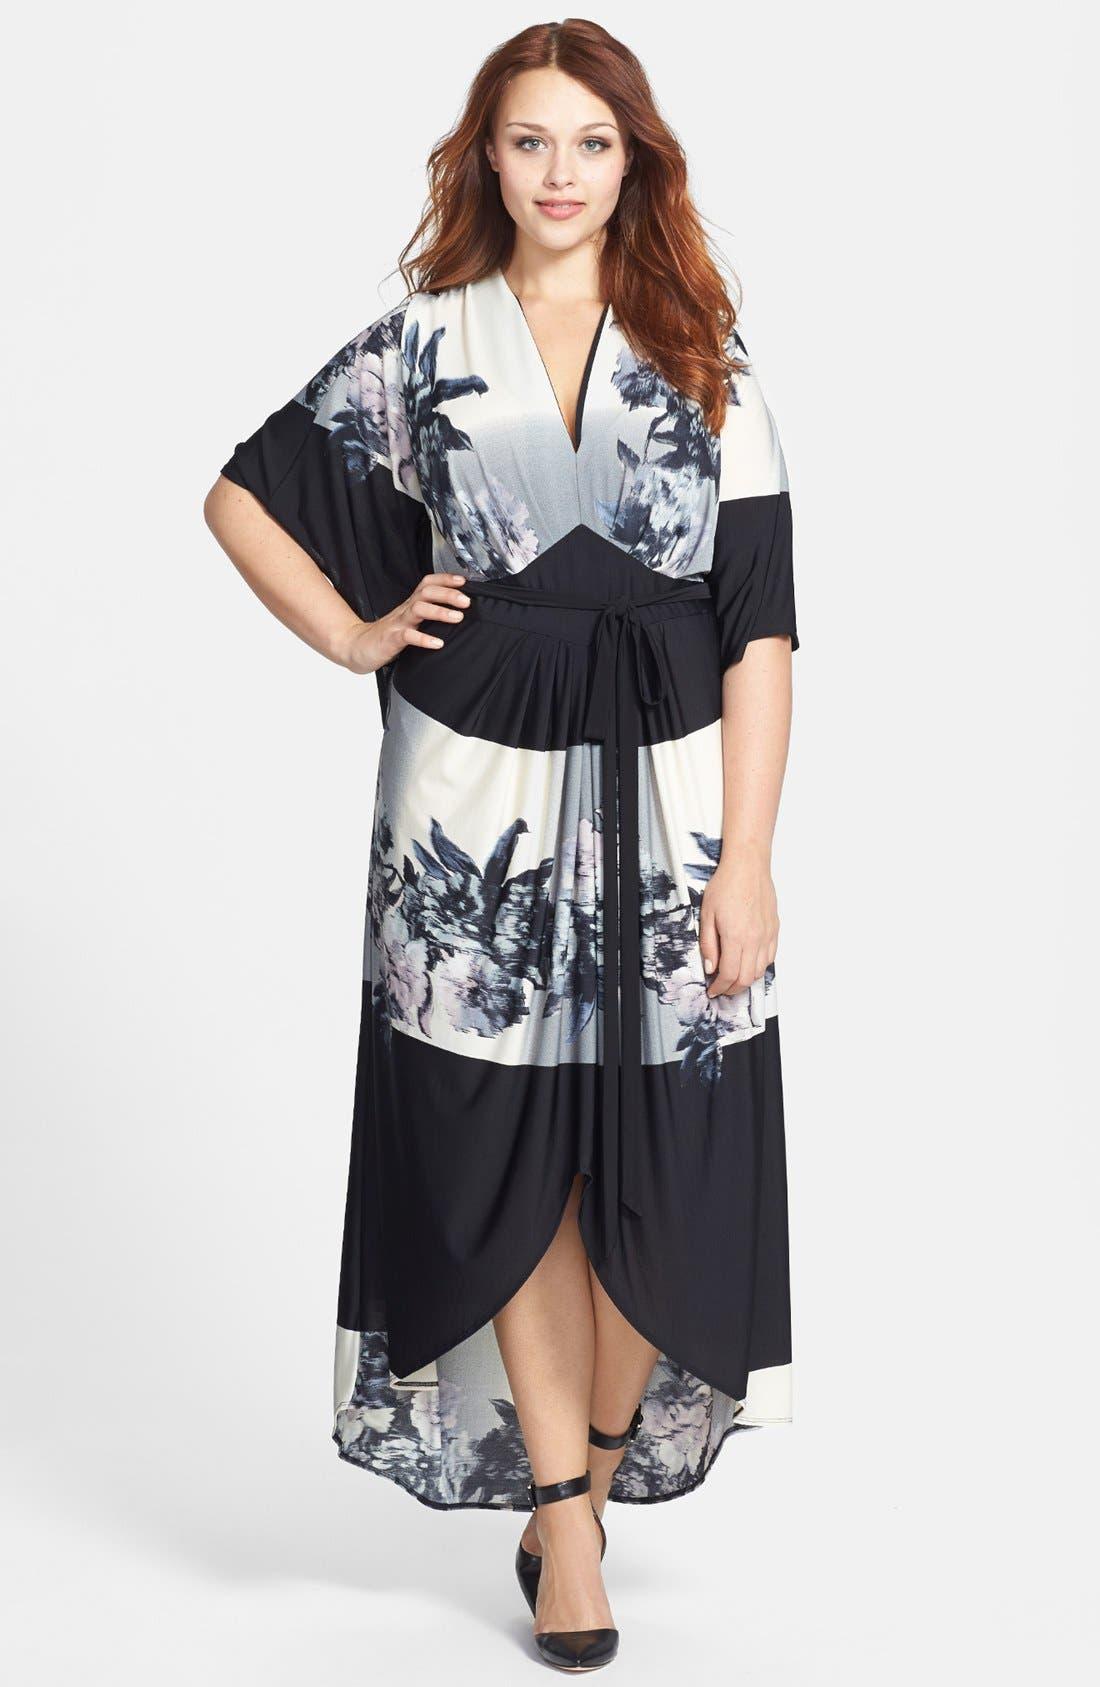 Alternate Image 1 Selected - ABS by Allen Schwartz 'Kaftan' Printed High/Low Maxi Dress (Plus Size)